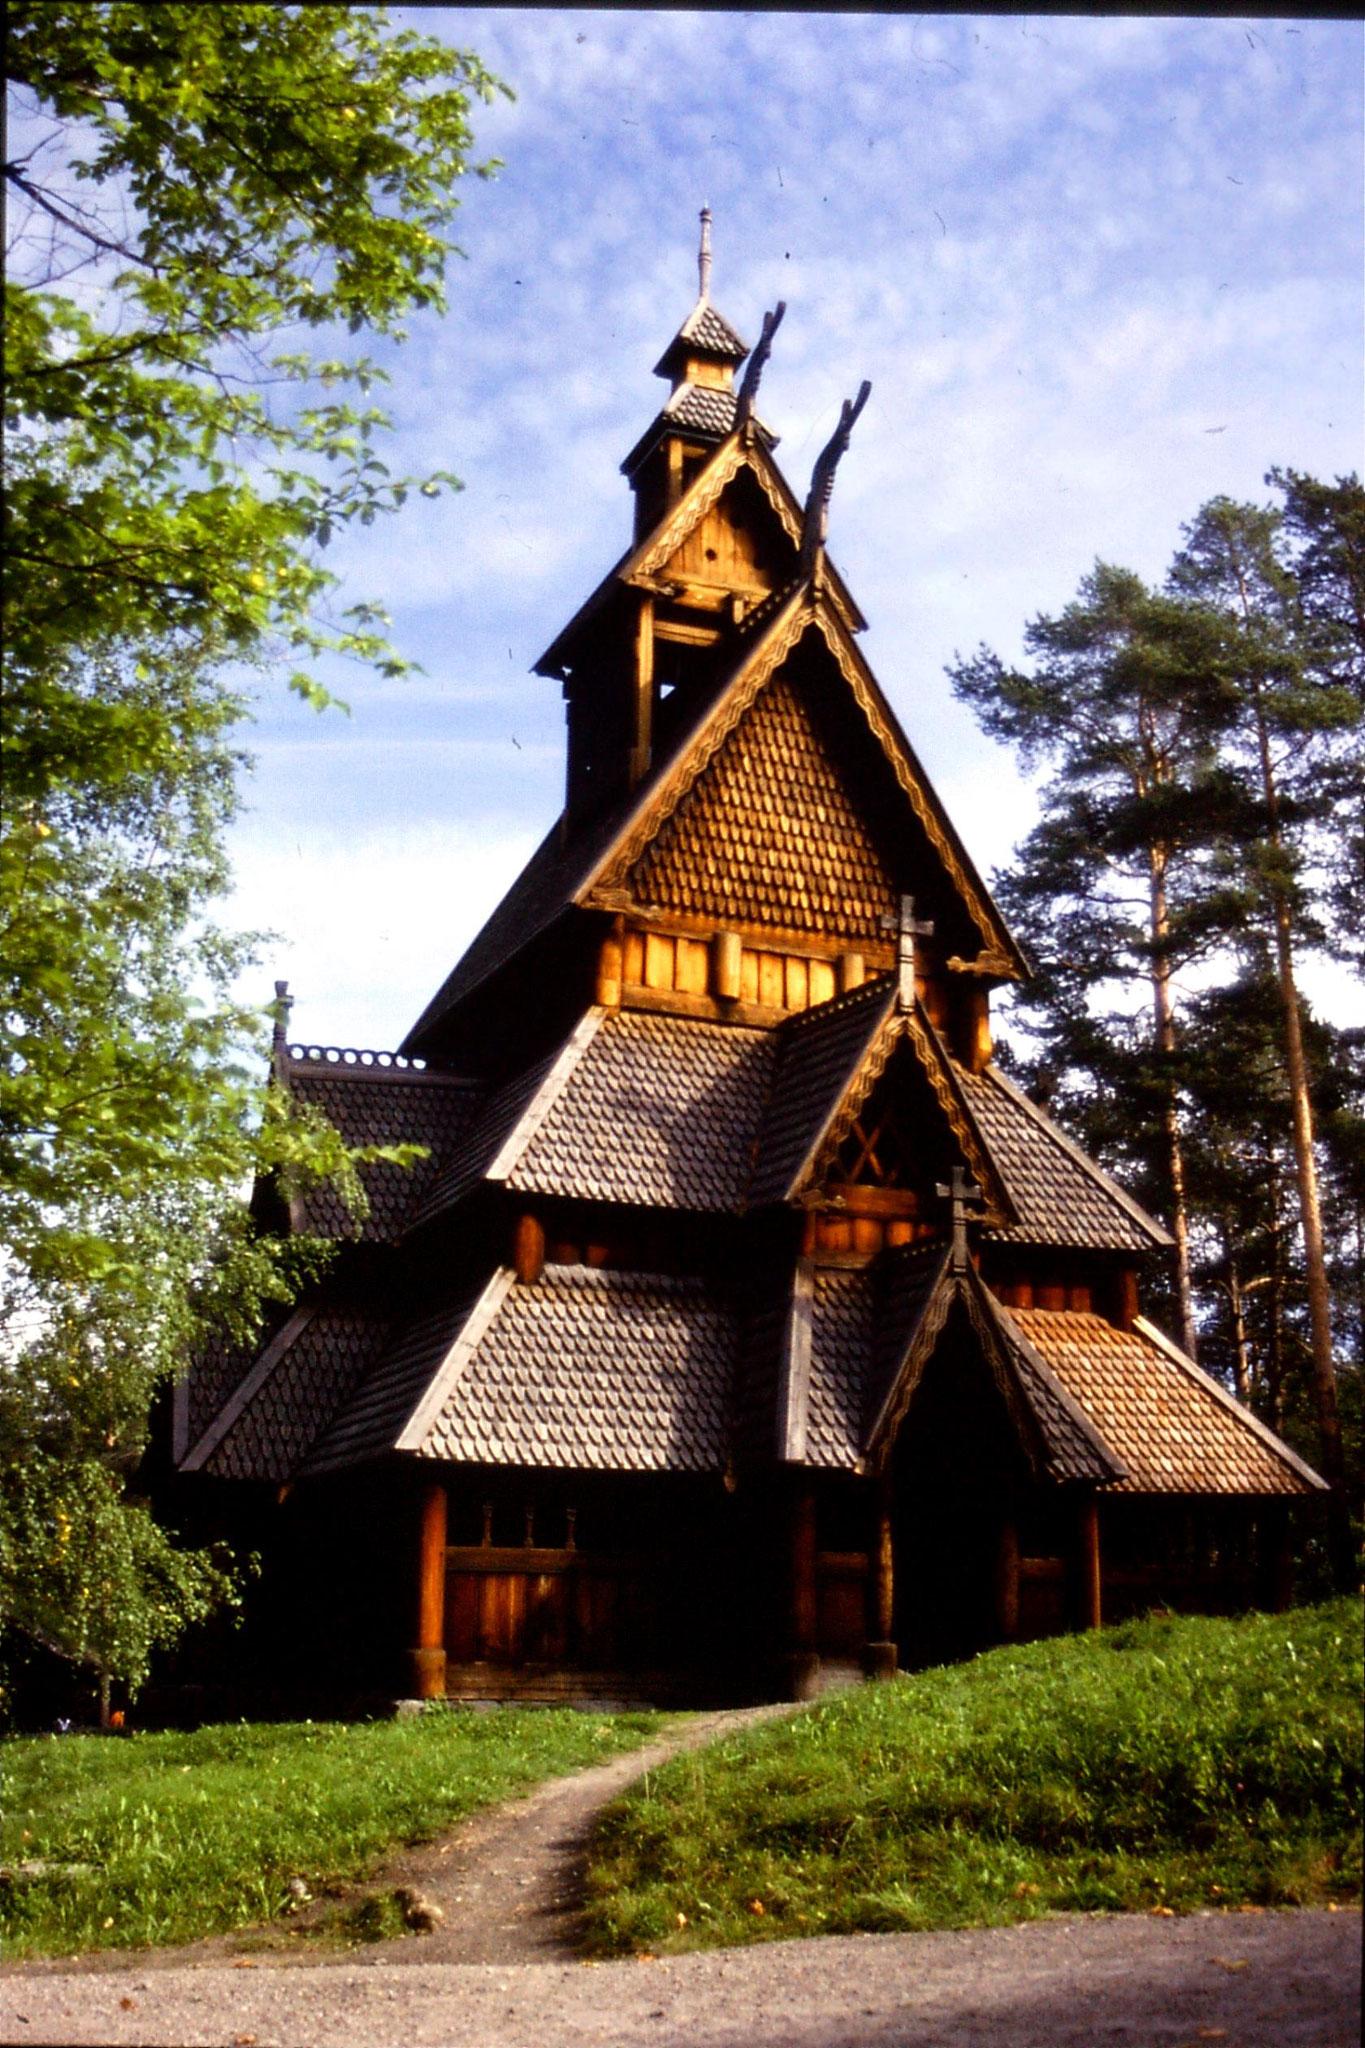 16/9/1988: 9: Oslo Folk Museum stave church